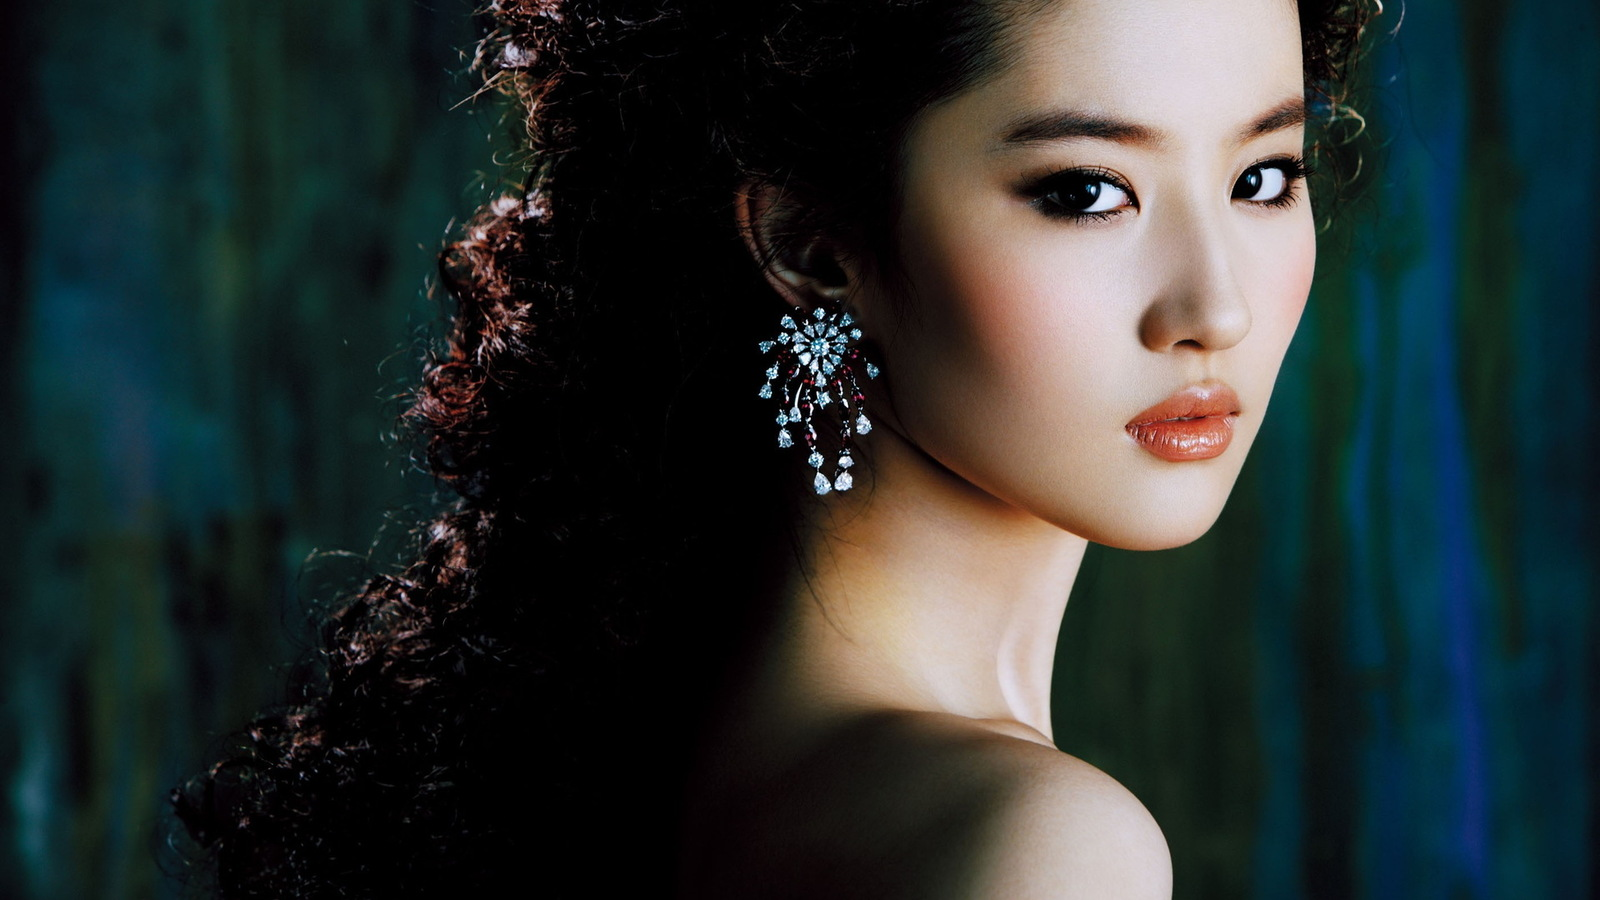 Японские красивые девушки фотки — photo 15